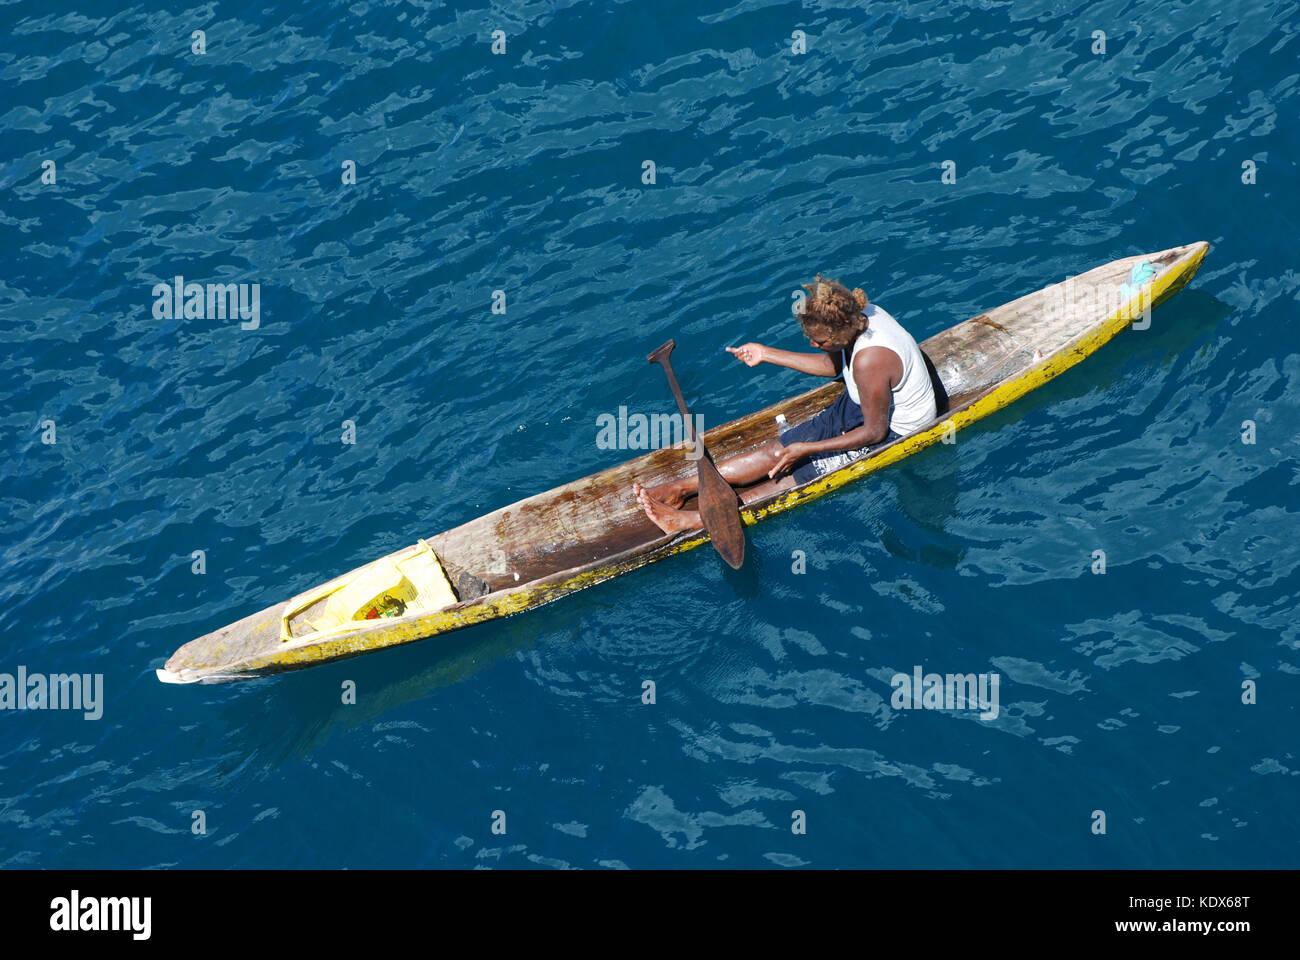 Local Fisherman in Dugout Canoe off Honiara Solomon Islands - Stock Image